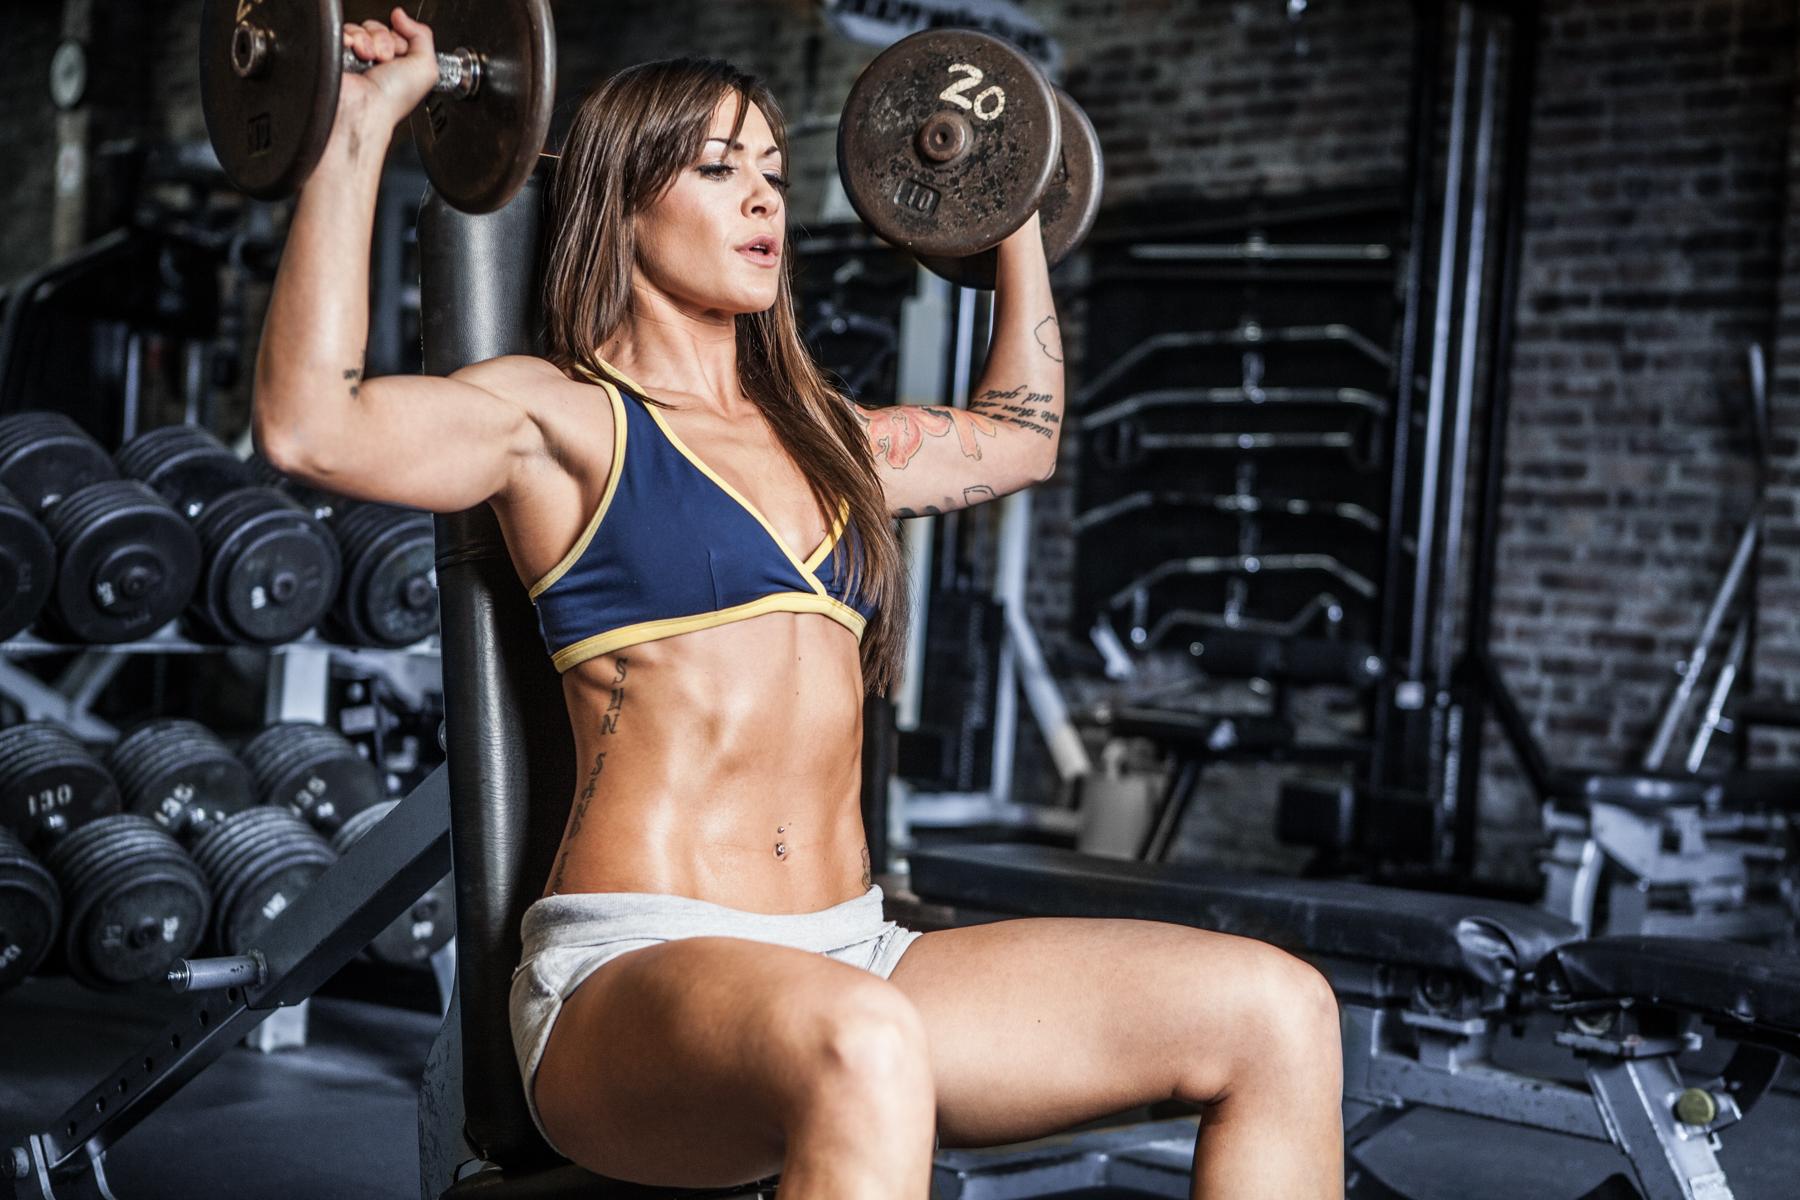 Body image media influence